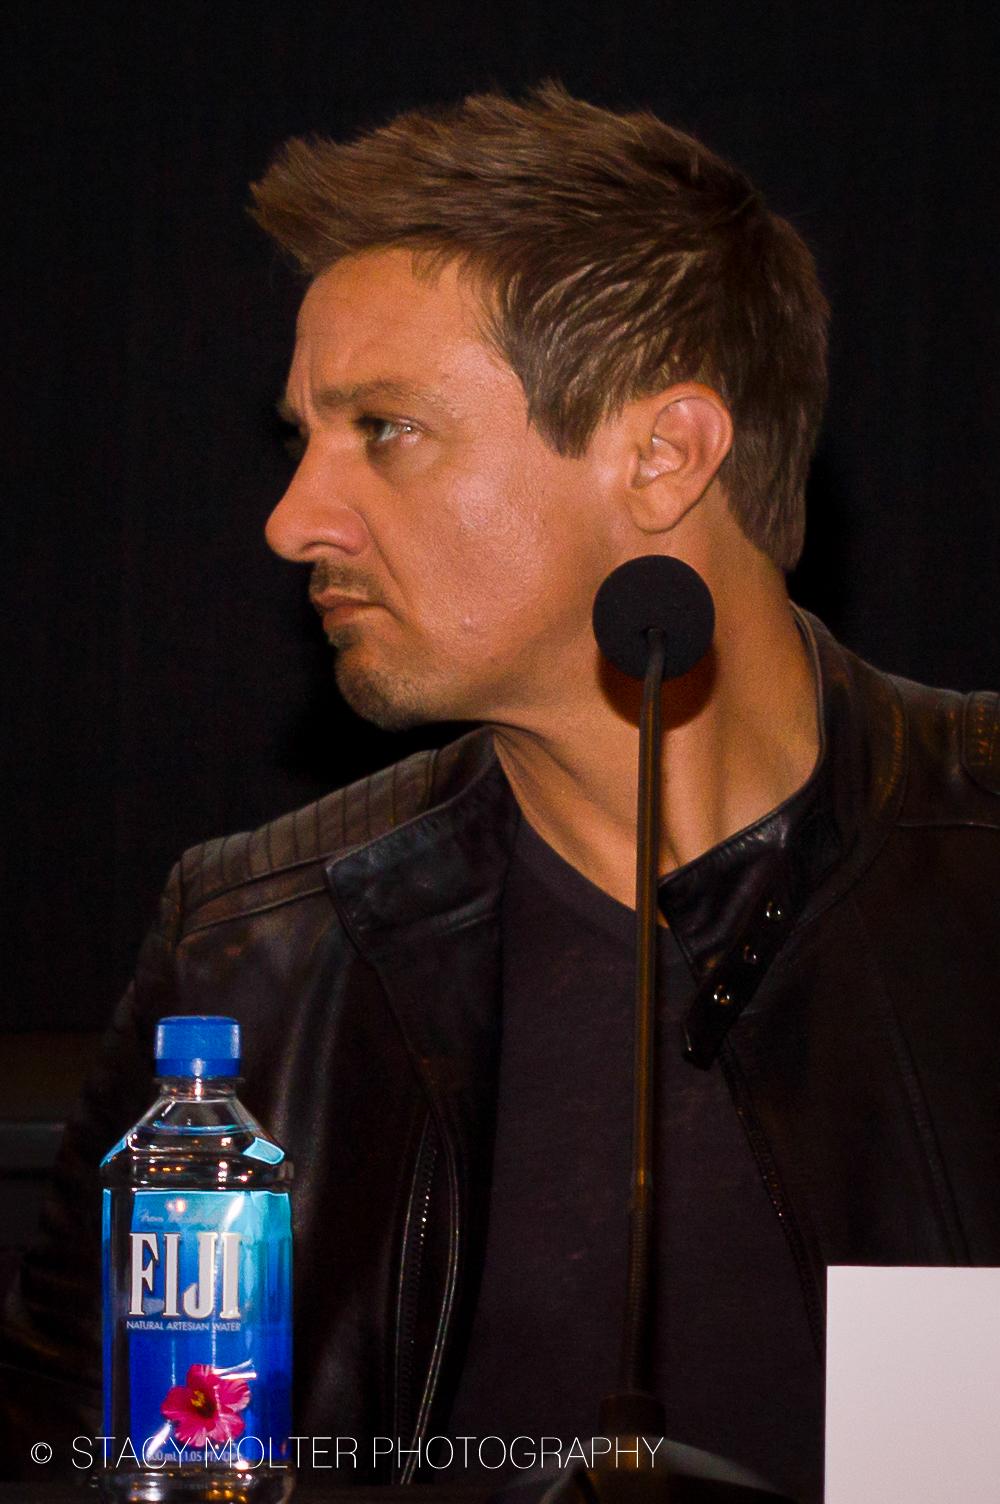 Jeremy Renner - Avengers Age of Ultron Press Conference Junket